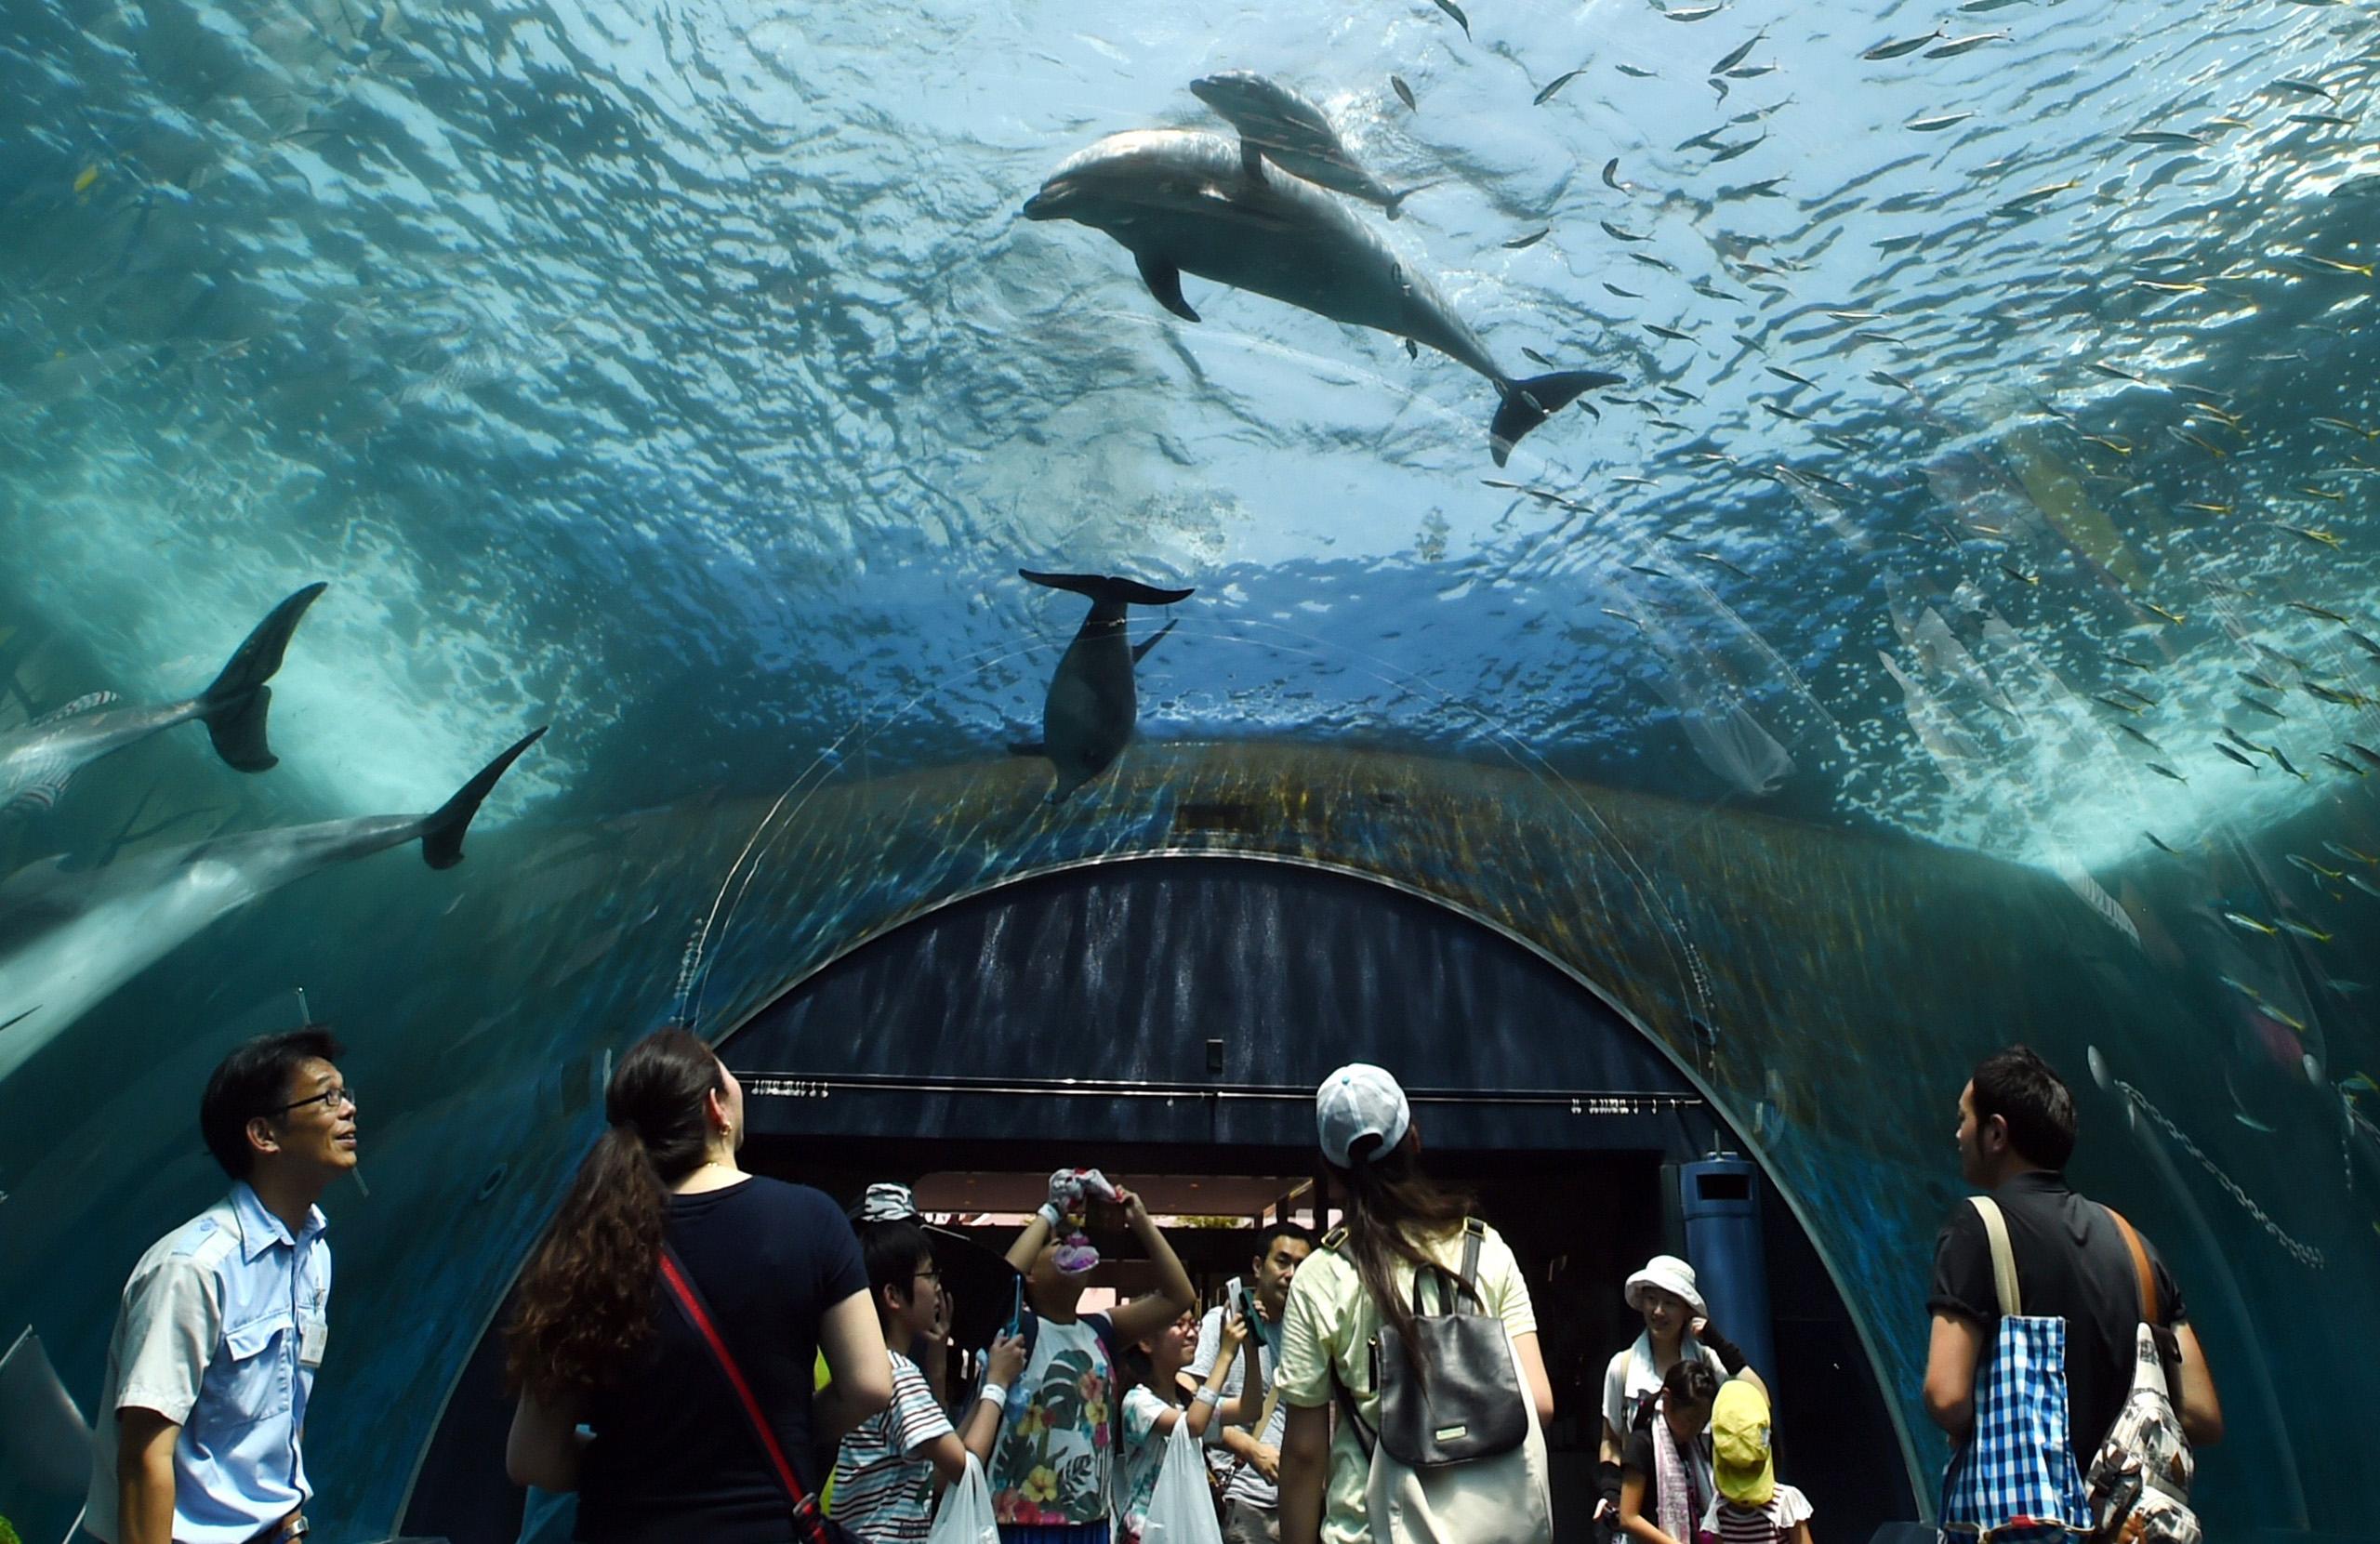 A baby bottlenose dolphin (top) swims beside his mother at the Hakkeijima Sea Paradise aquarium in Yokohama, suburban Tokyo on July 20, 2015.